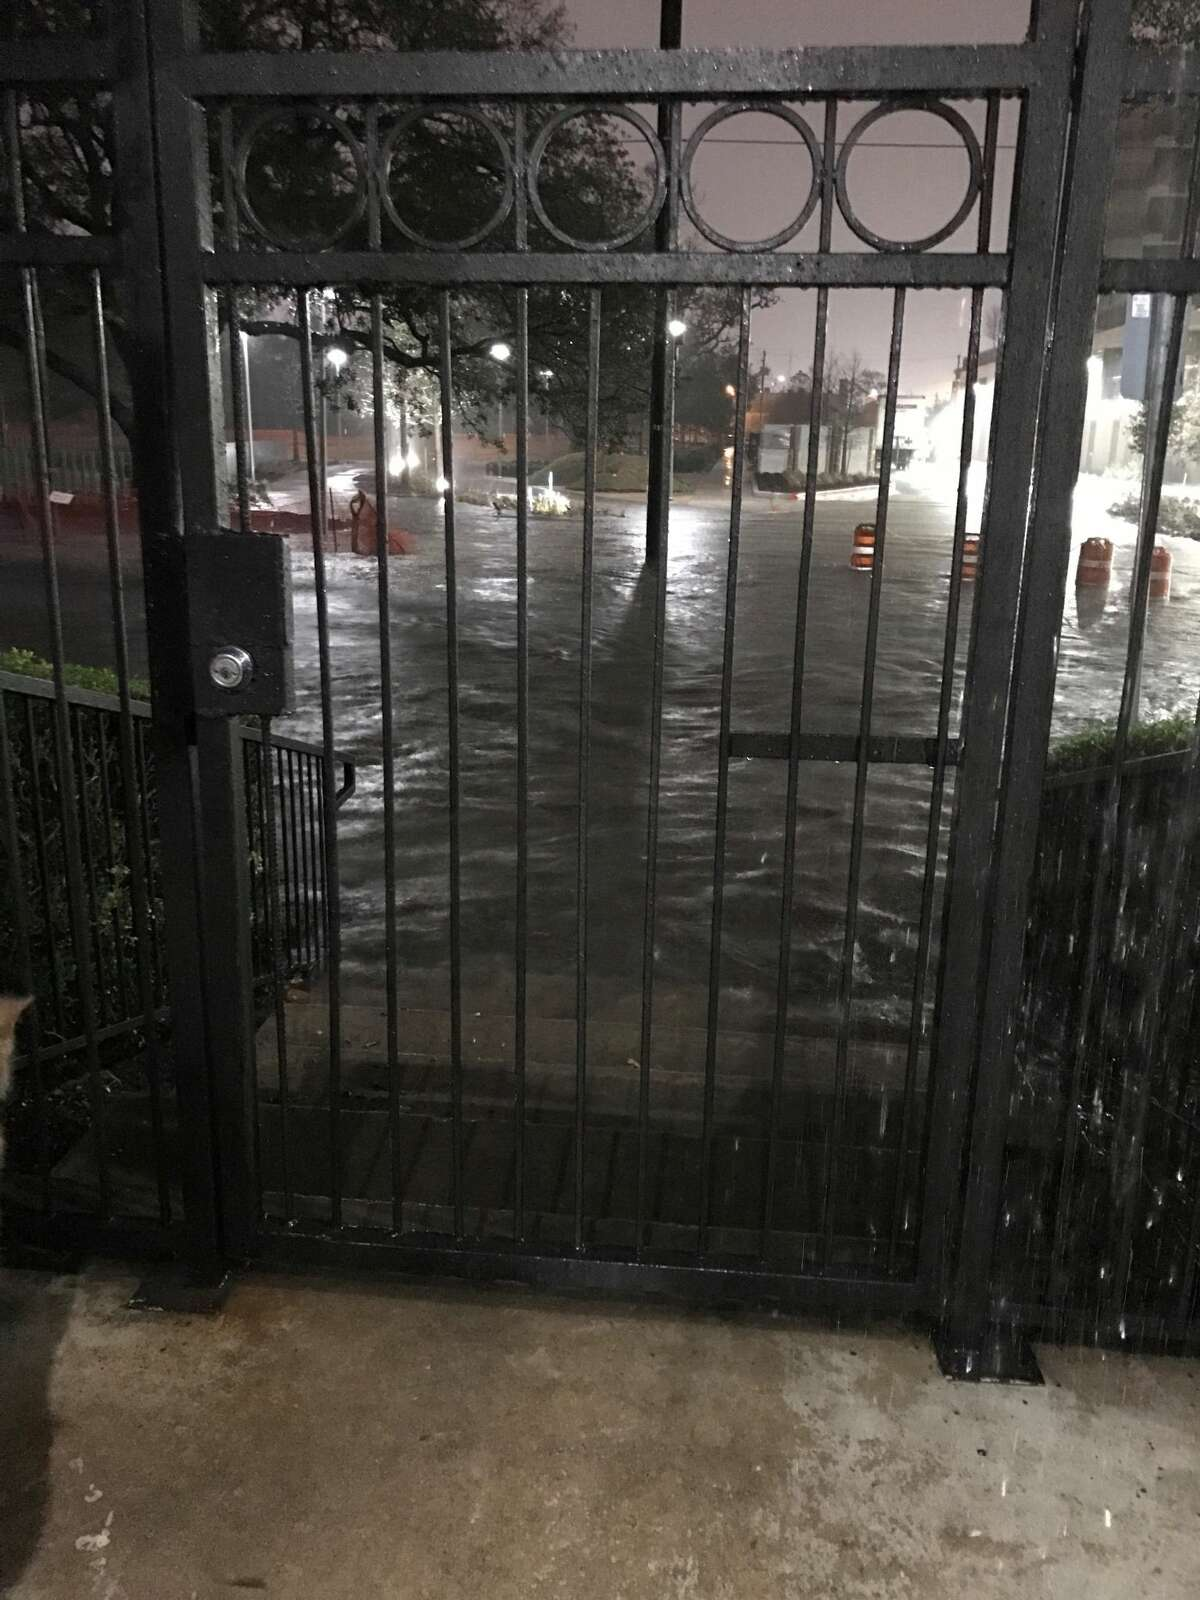 Heavy overnight rains caused widespread flooding across the Houston area, Wednesday, Jan. 18, 2017.